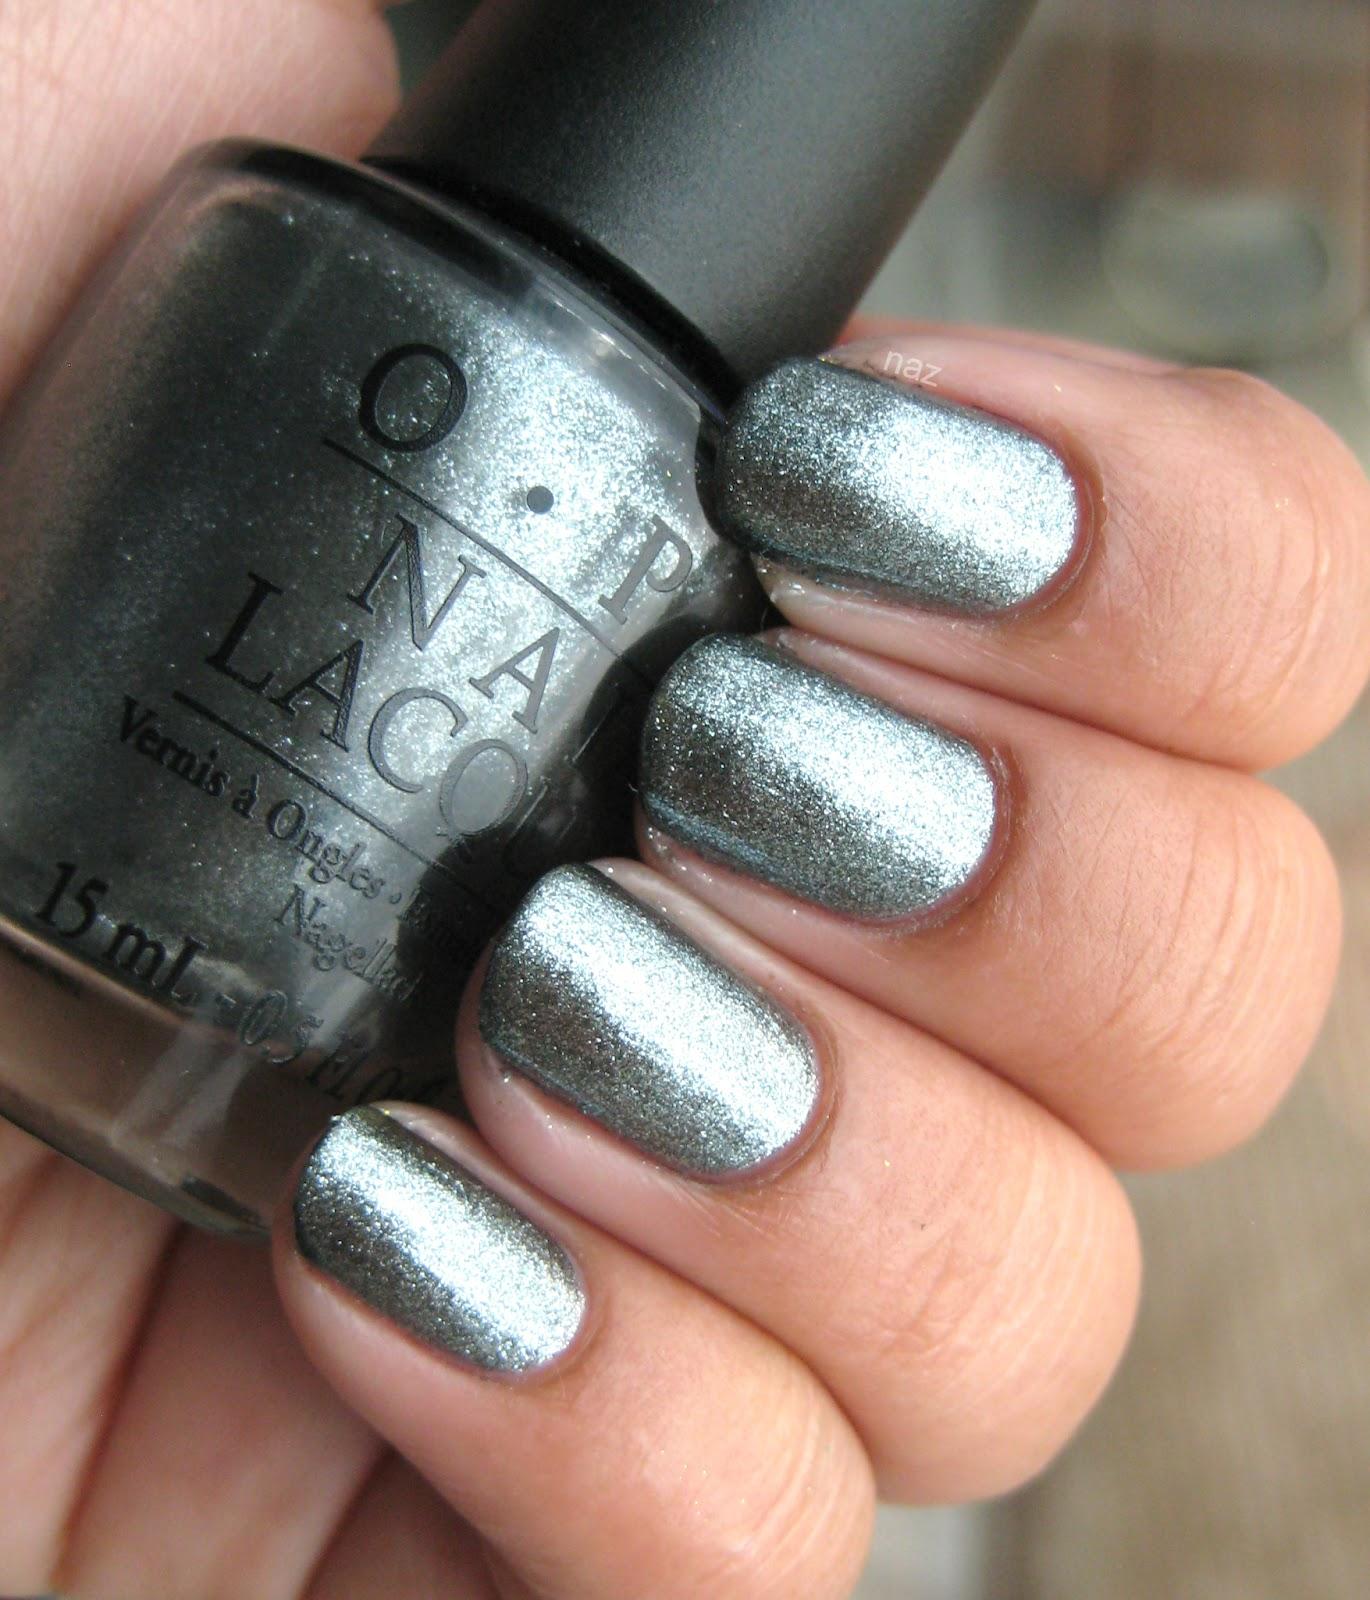 Light Grey Nail Polish Naz's Nails: OPI Lucerne-tainly Look Marvelous